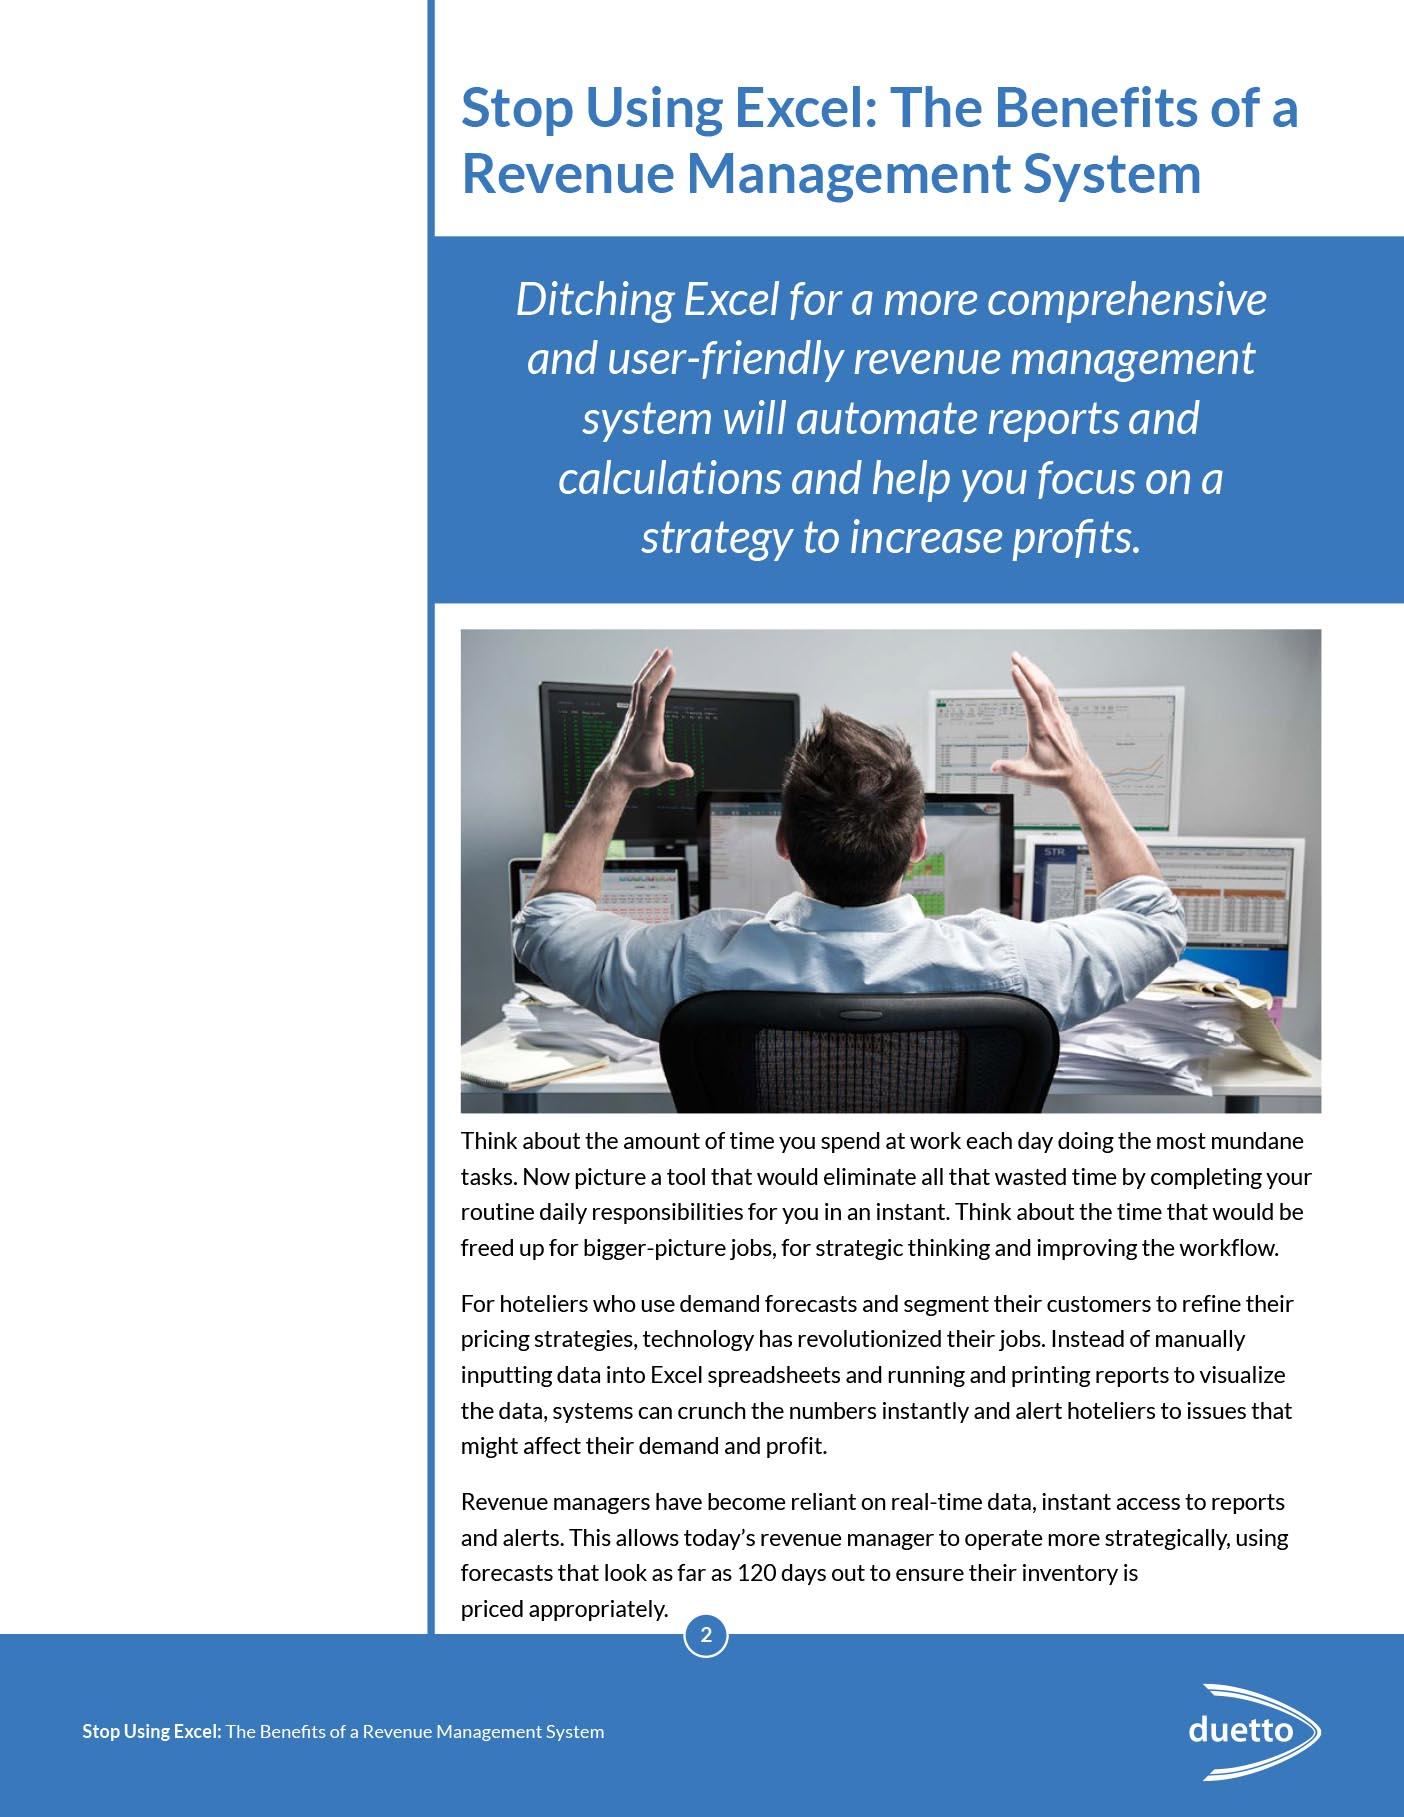 2 Stop-Using-Excel-Benefits-Revenue-Management-System-2.jpg